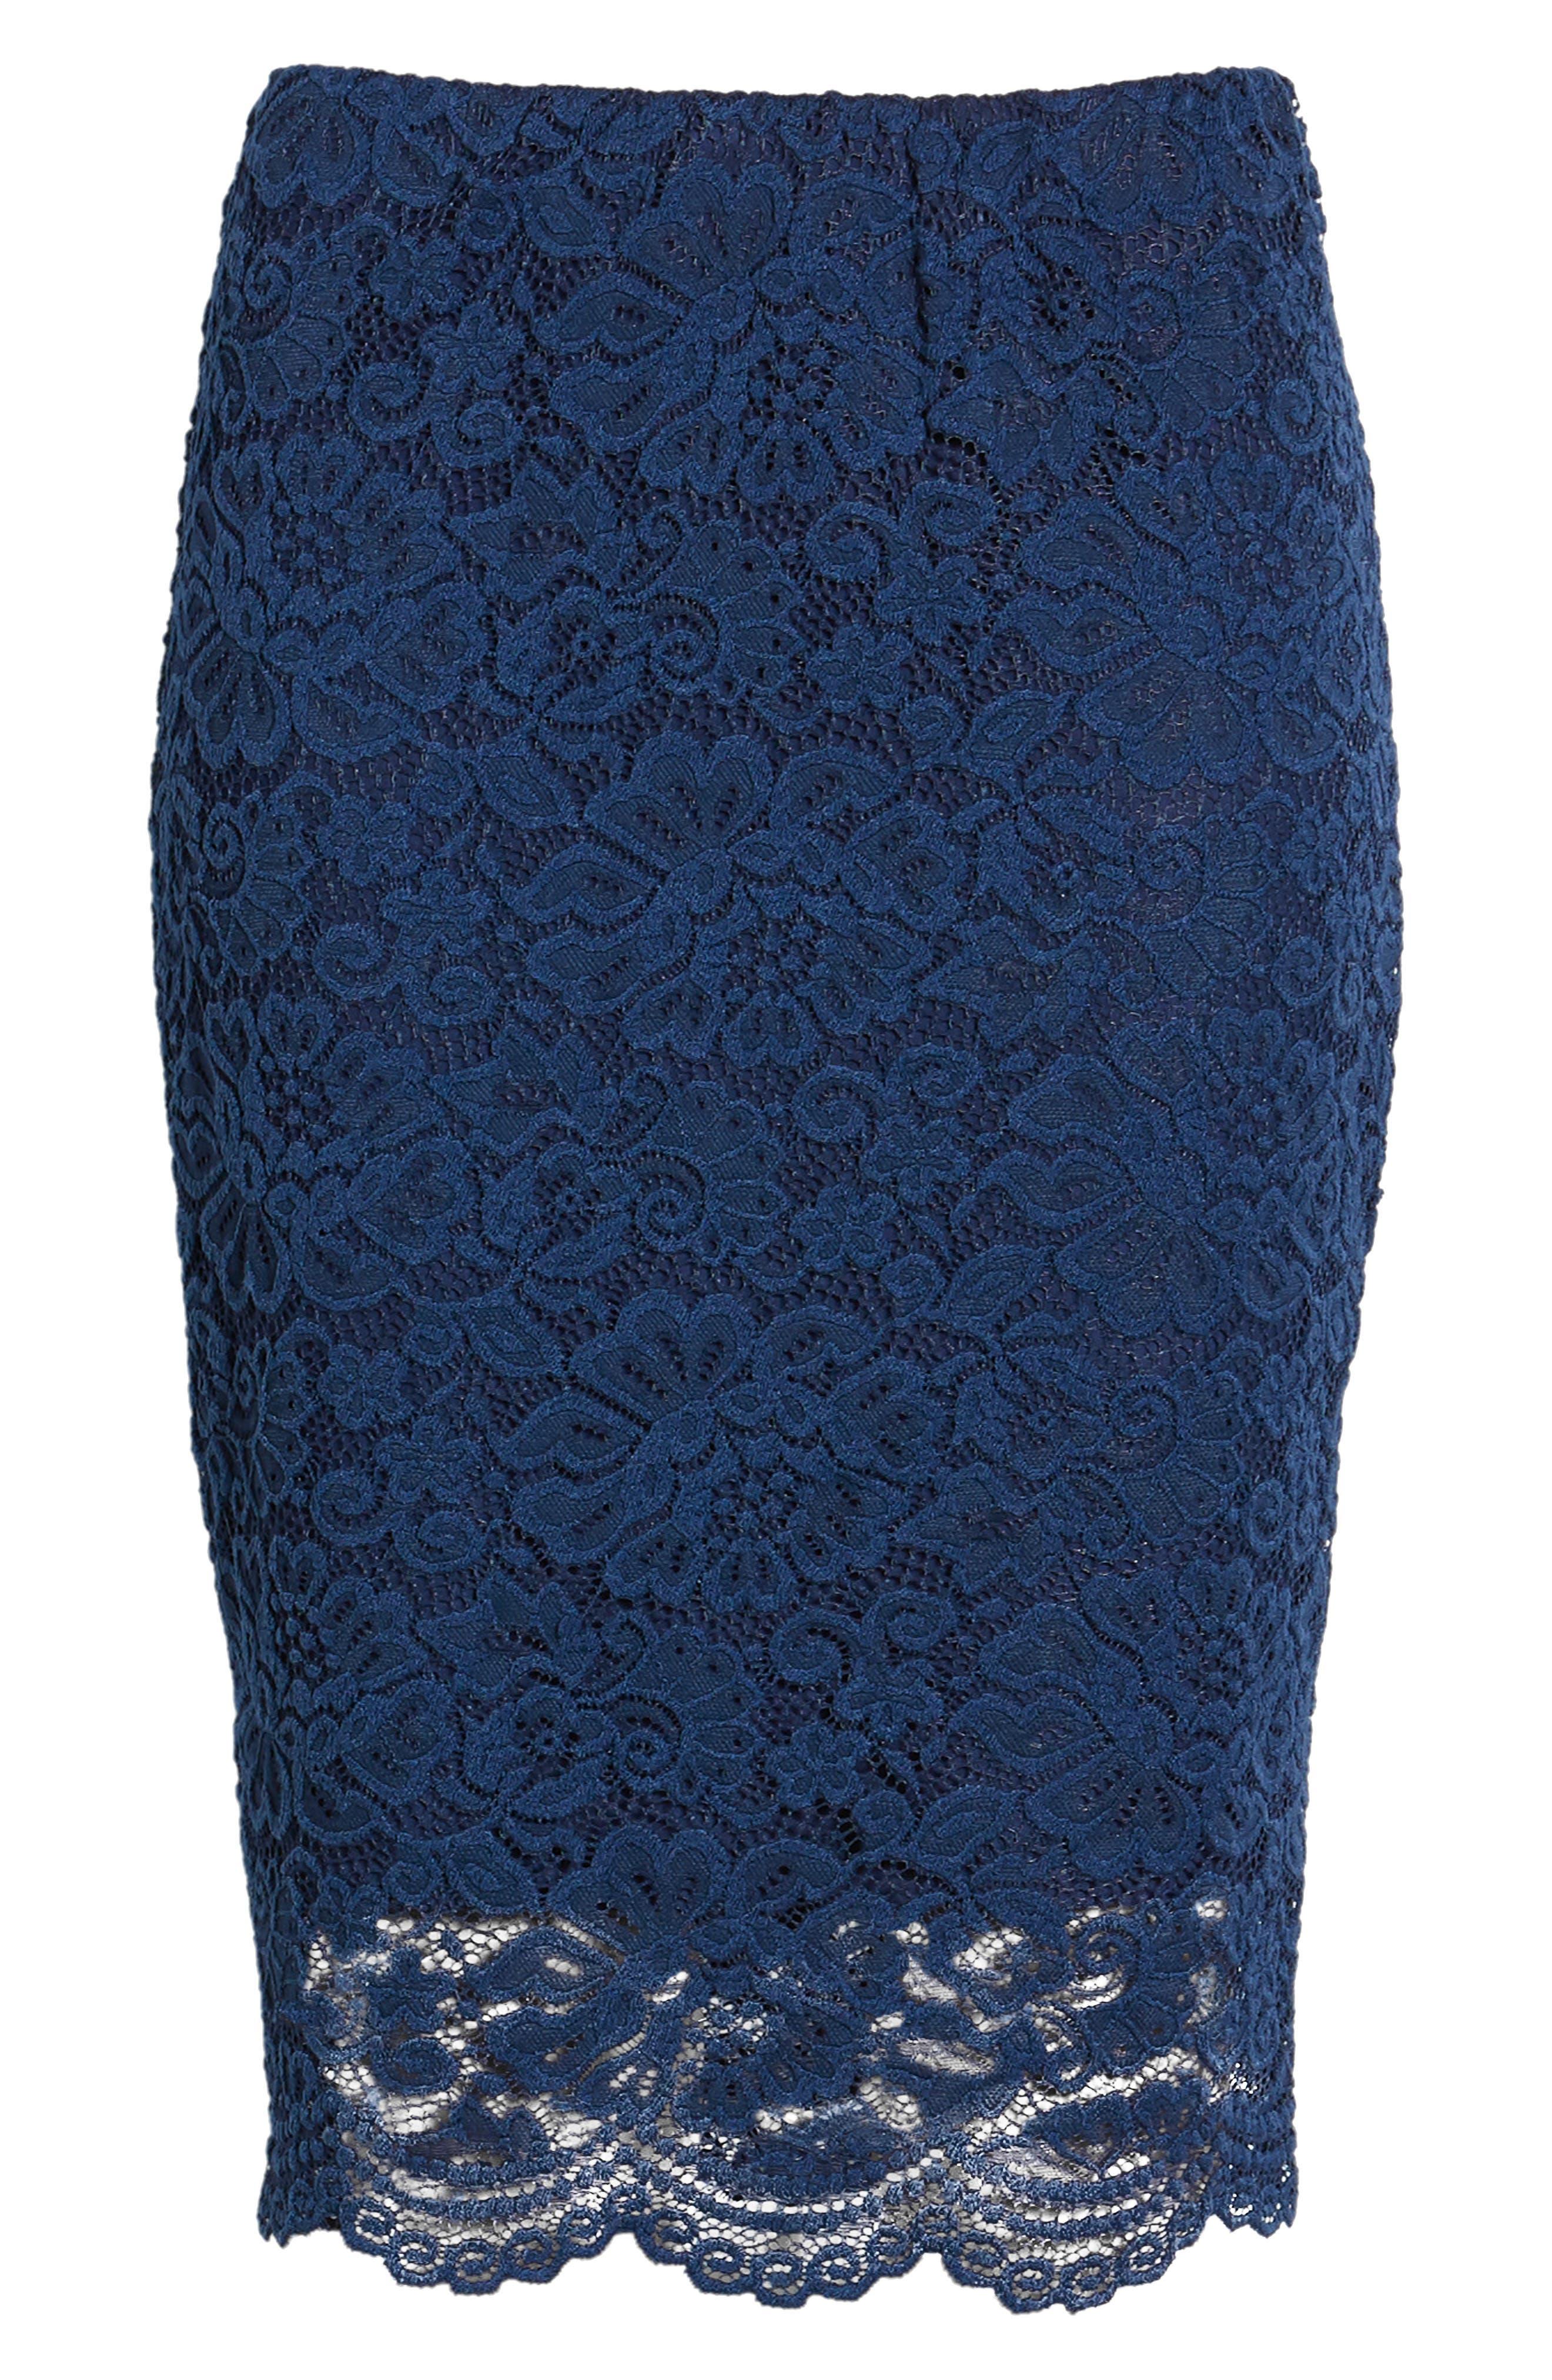 ROSEMUNDE, Filippa Scalloped Lace Skirt, Alternate thumbnail 6, color, NAVY PEONY